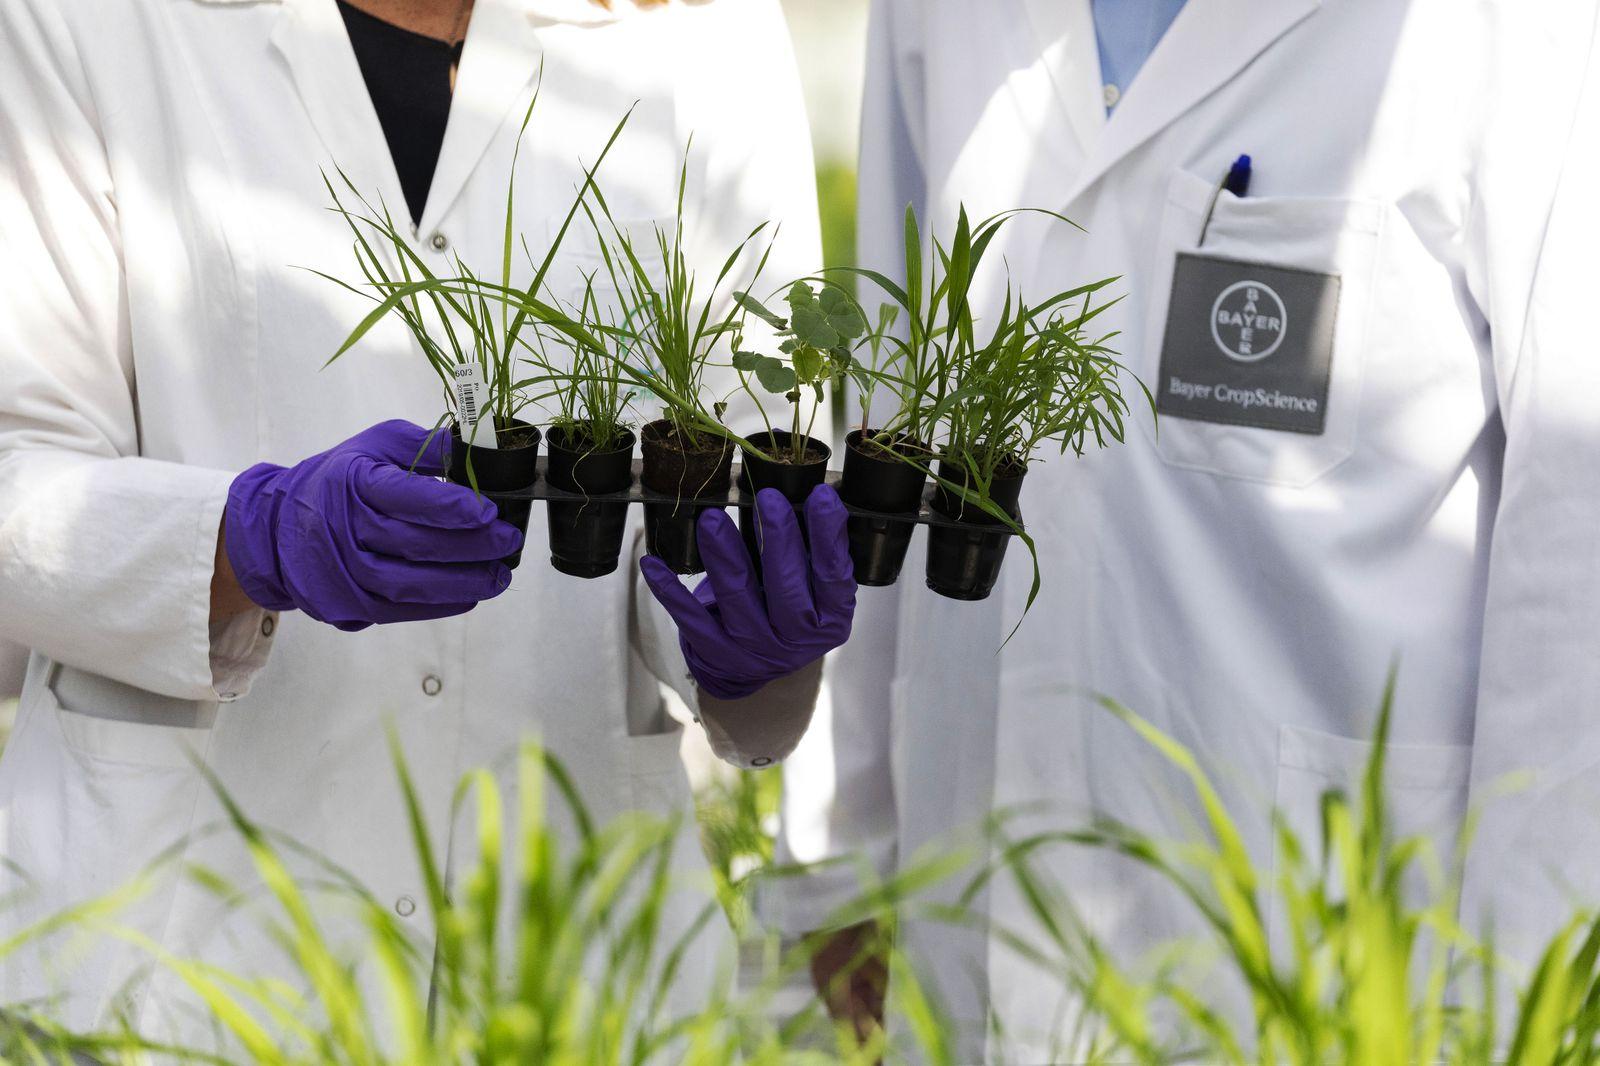 Bayer AG Pumps Billions of Euros Into Weedkiller Alternatives